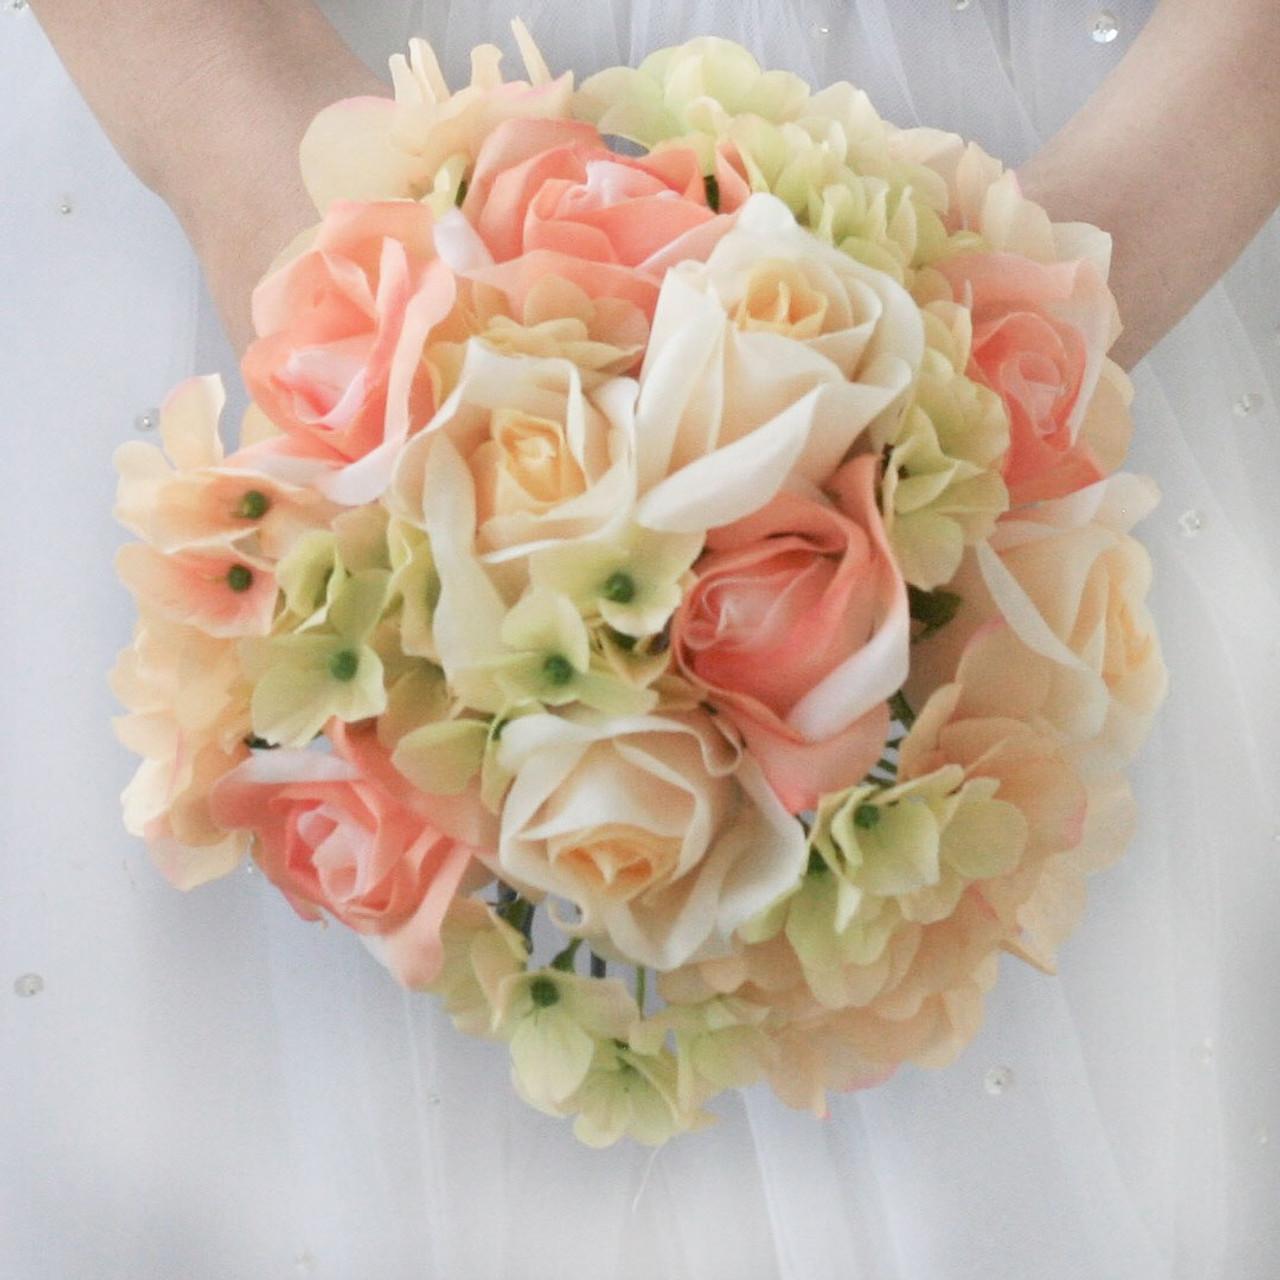 Silk Flowers Wedding Bouquets.Hydrangea Rose Coral Yellow Peach Artificial Wedding Bouquets Silk Wedding Flowers Bridesmaid Bouquets Small